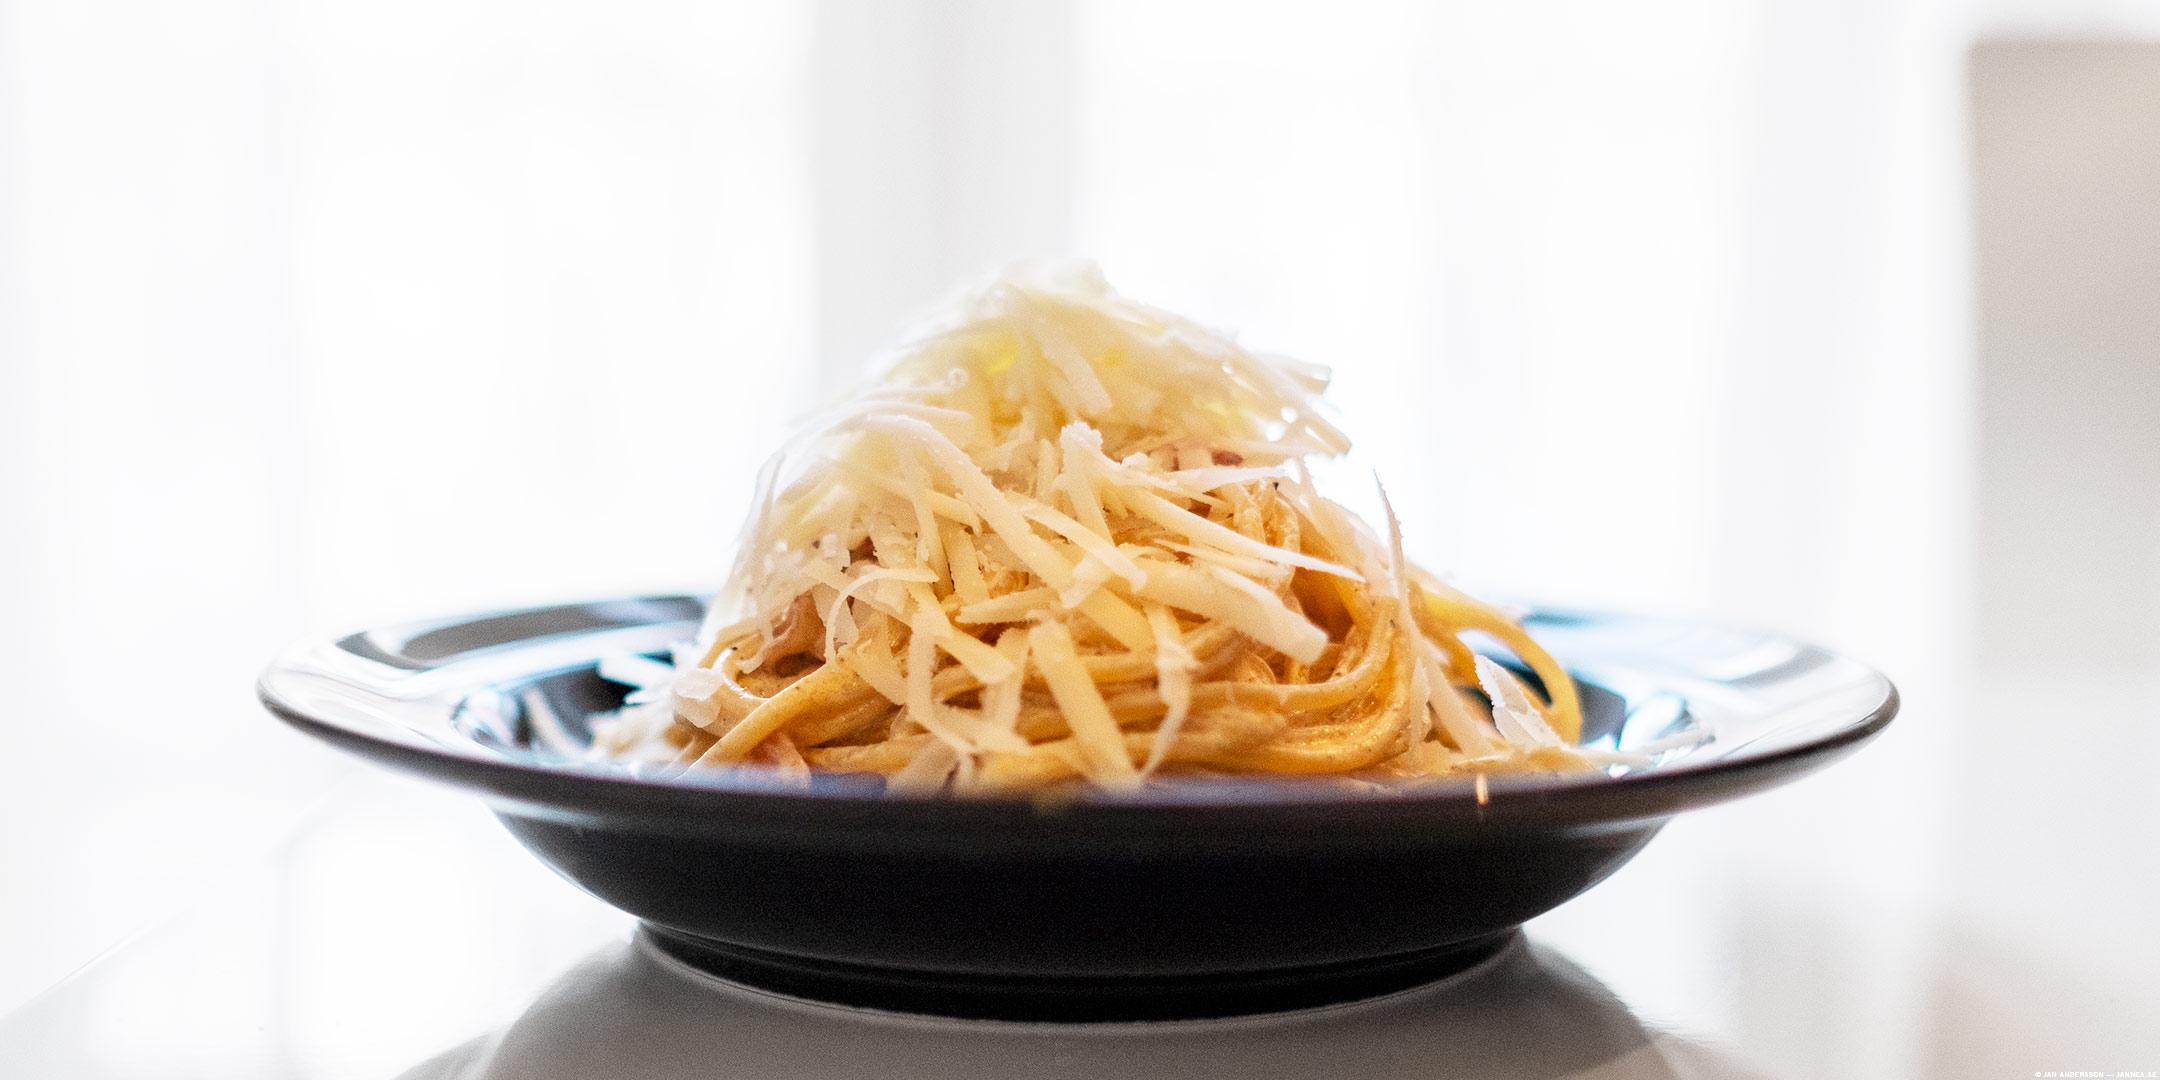 Carbonara-söndag med massor med Parmesan på toppen |© Jan Andersson